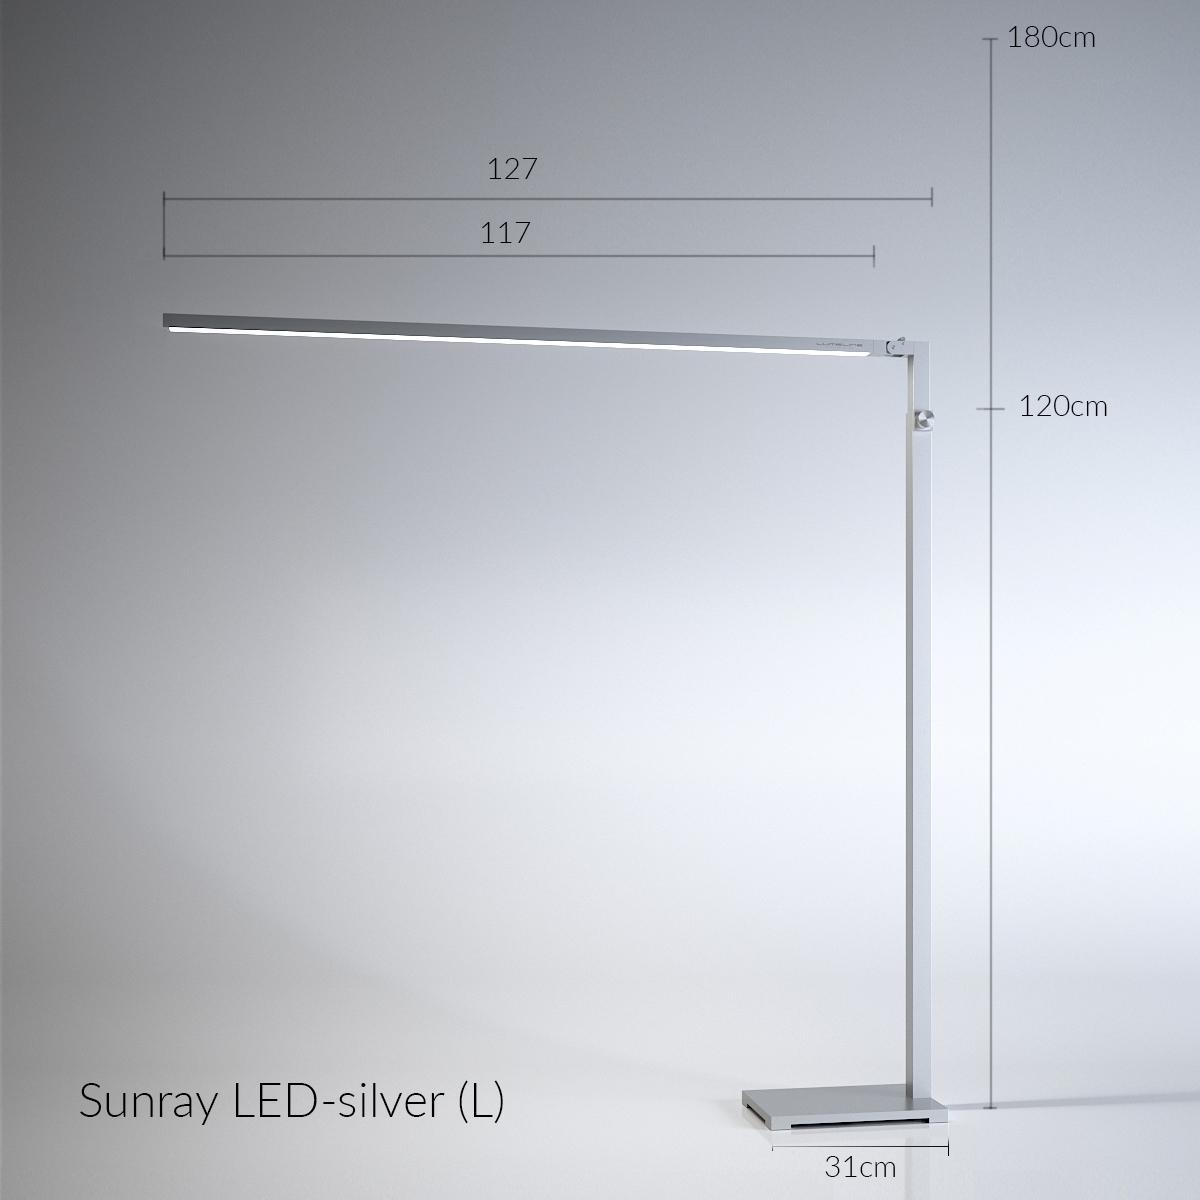 LED_silver_L_wymiary